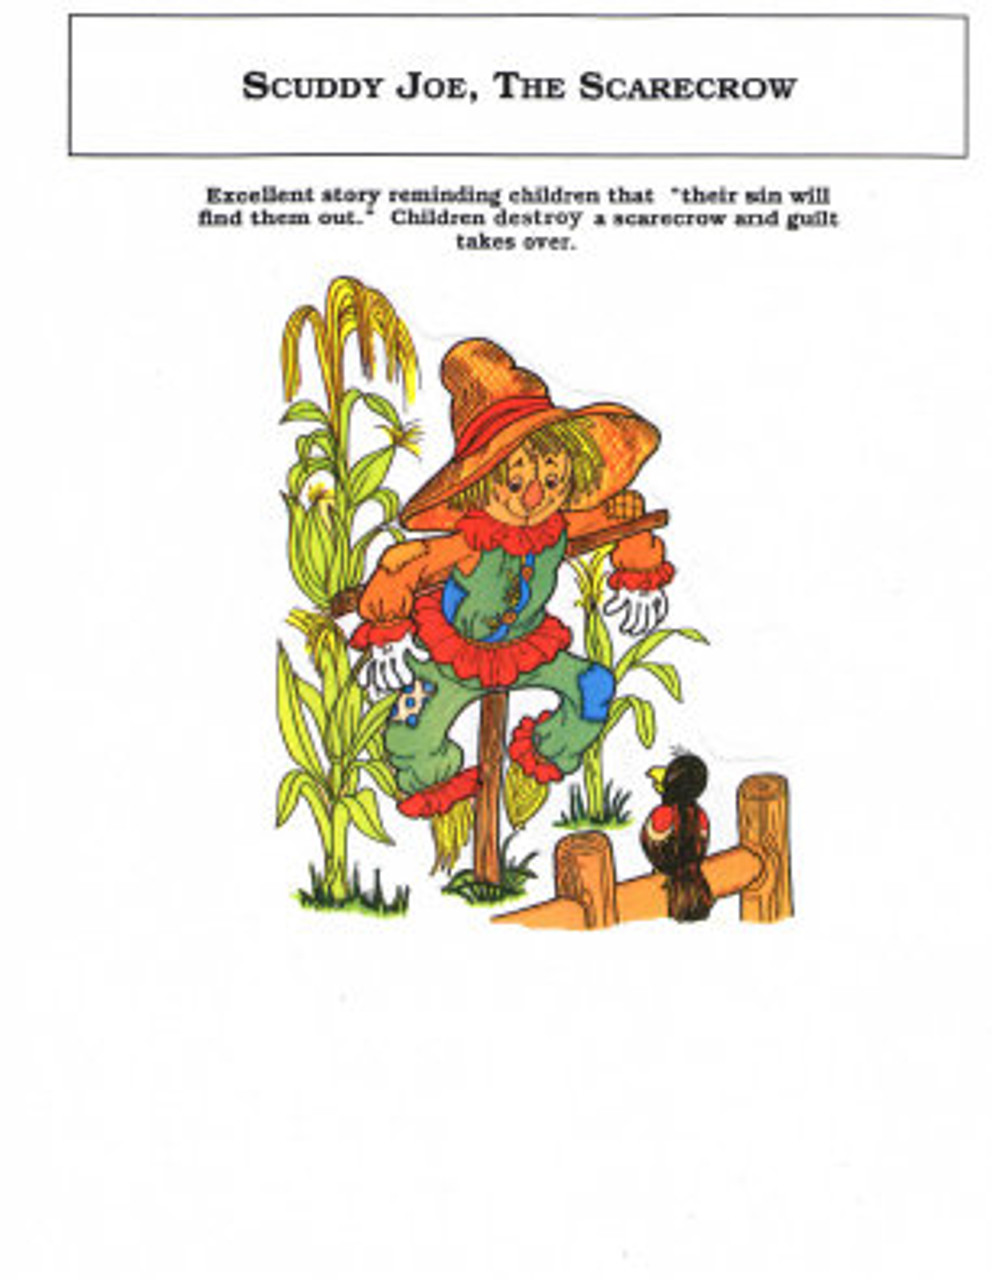 Scuddy Joe, The Scarecrow (object story)